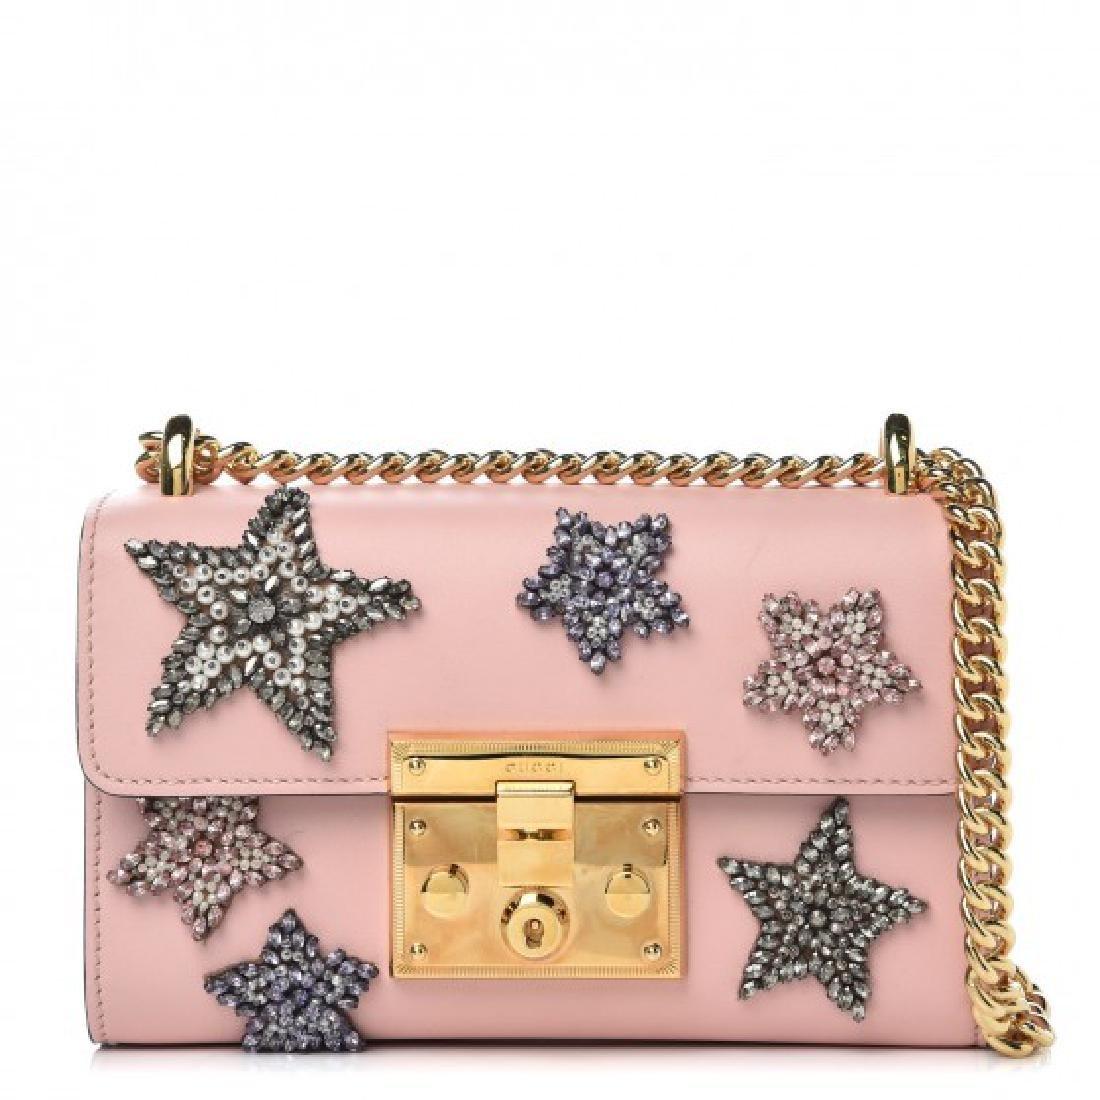 Gucci Calfskin Embroidered Star Small Padlock Shoulder